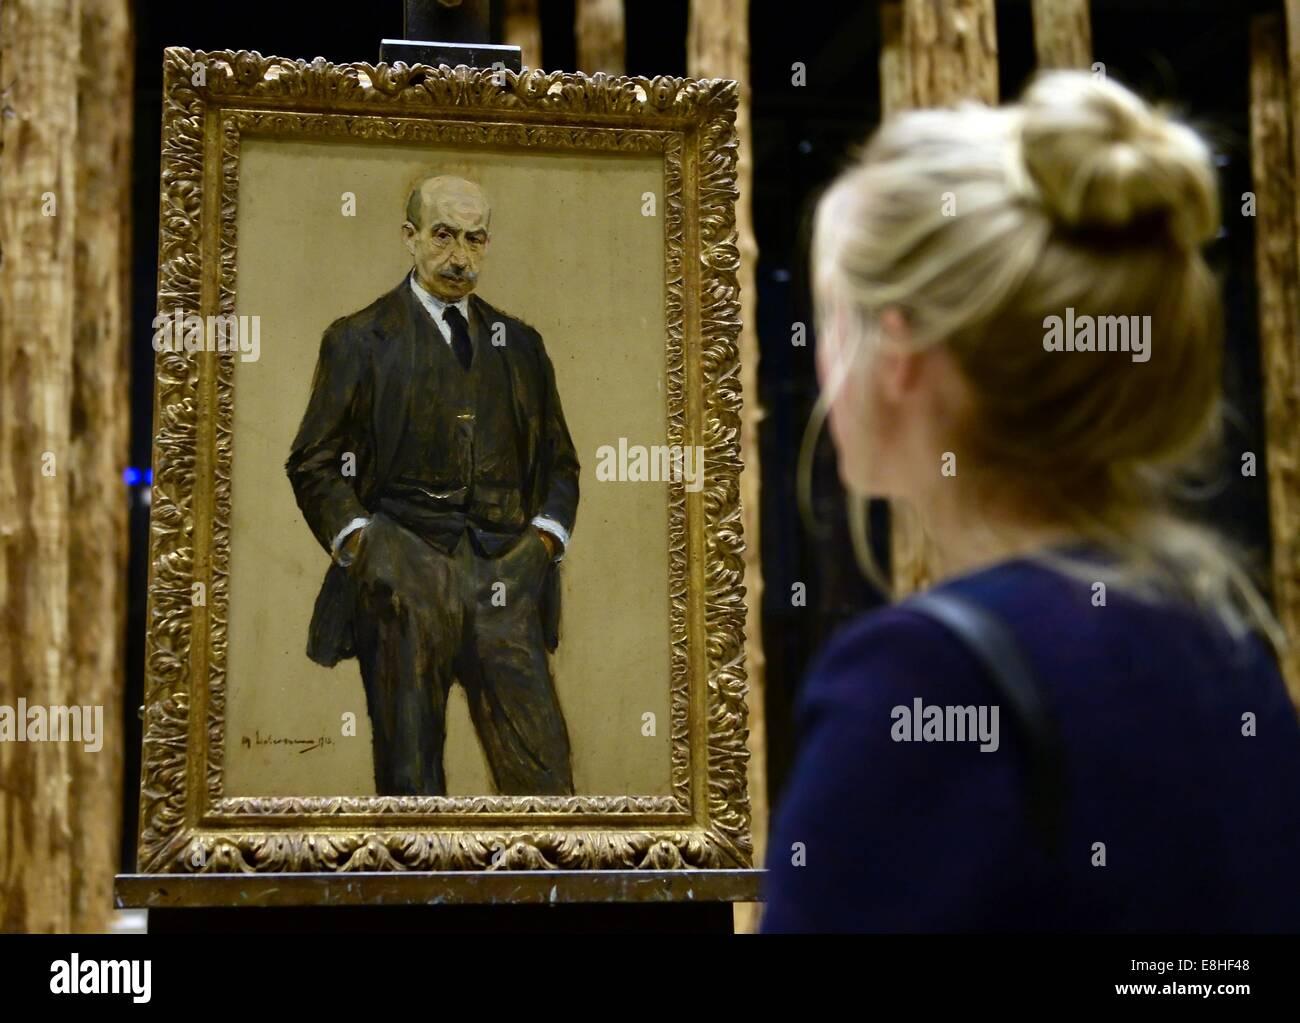 Berlin, Germany. 7th Oct, 2014. A visitor looks at the self portrait 'Stehend in Dreiviertelfigur, beide Haende Stock Photo